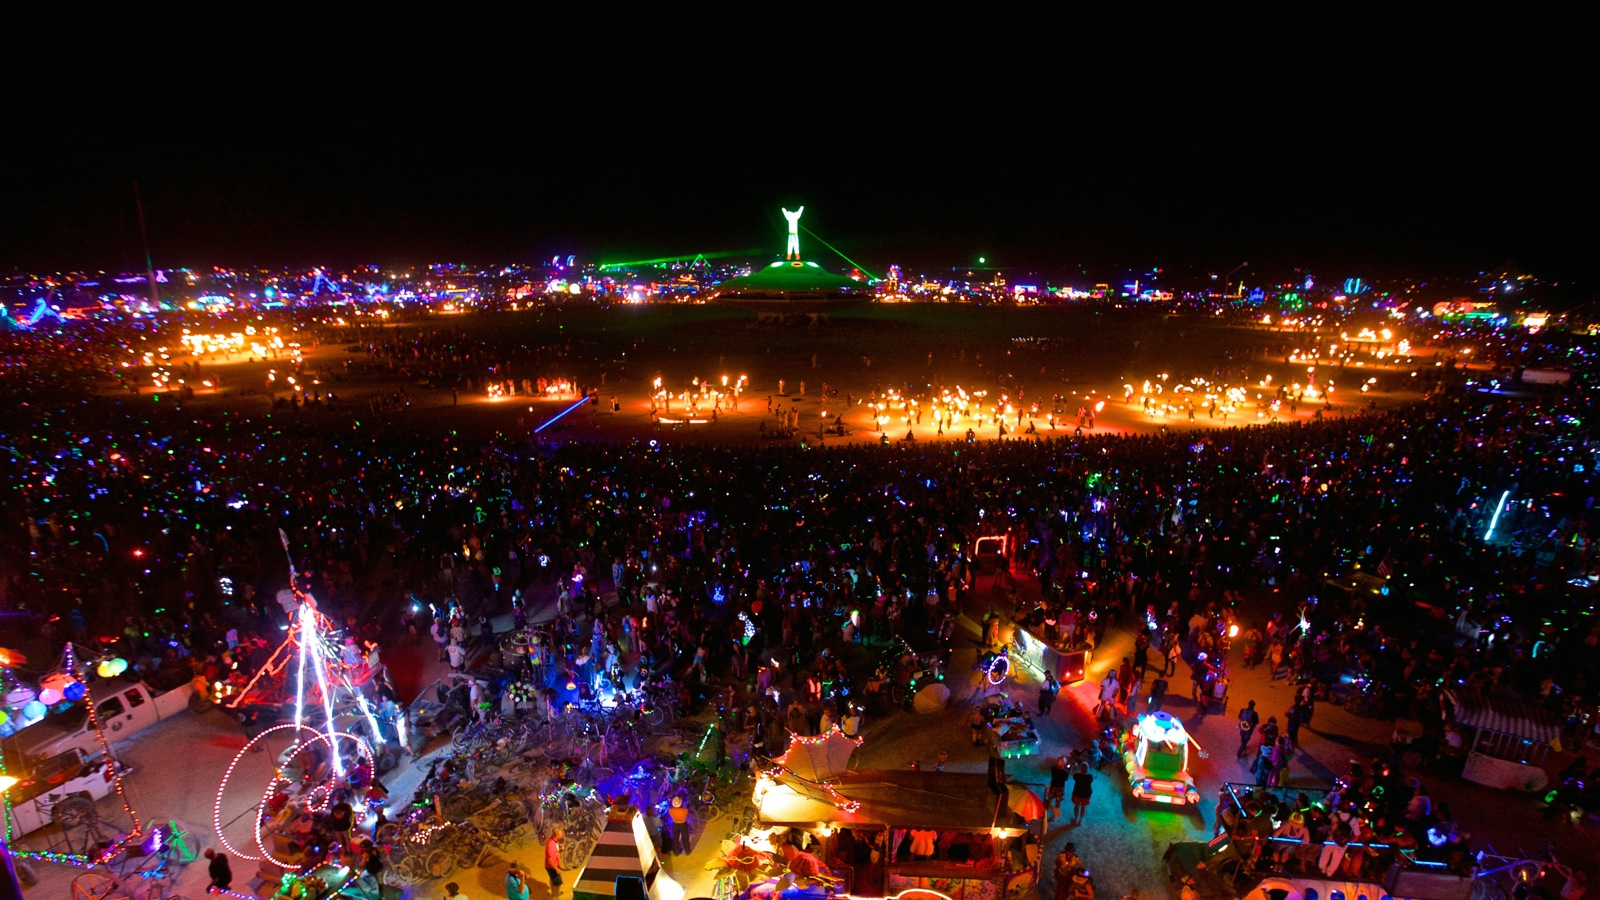 Hero Burning Man Sidney Erthal